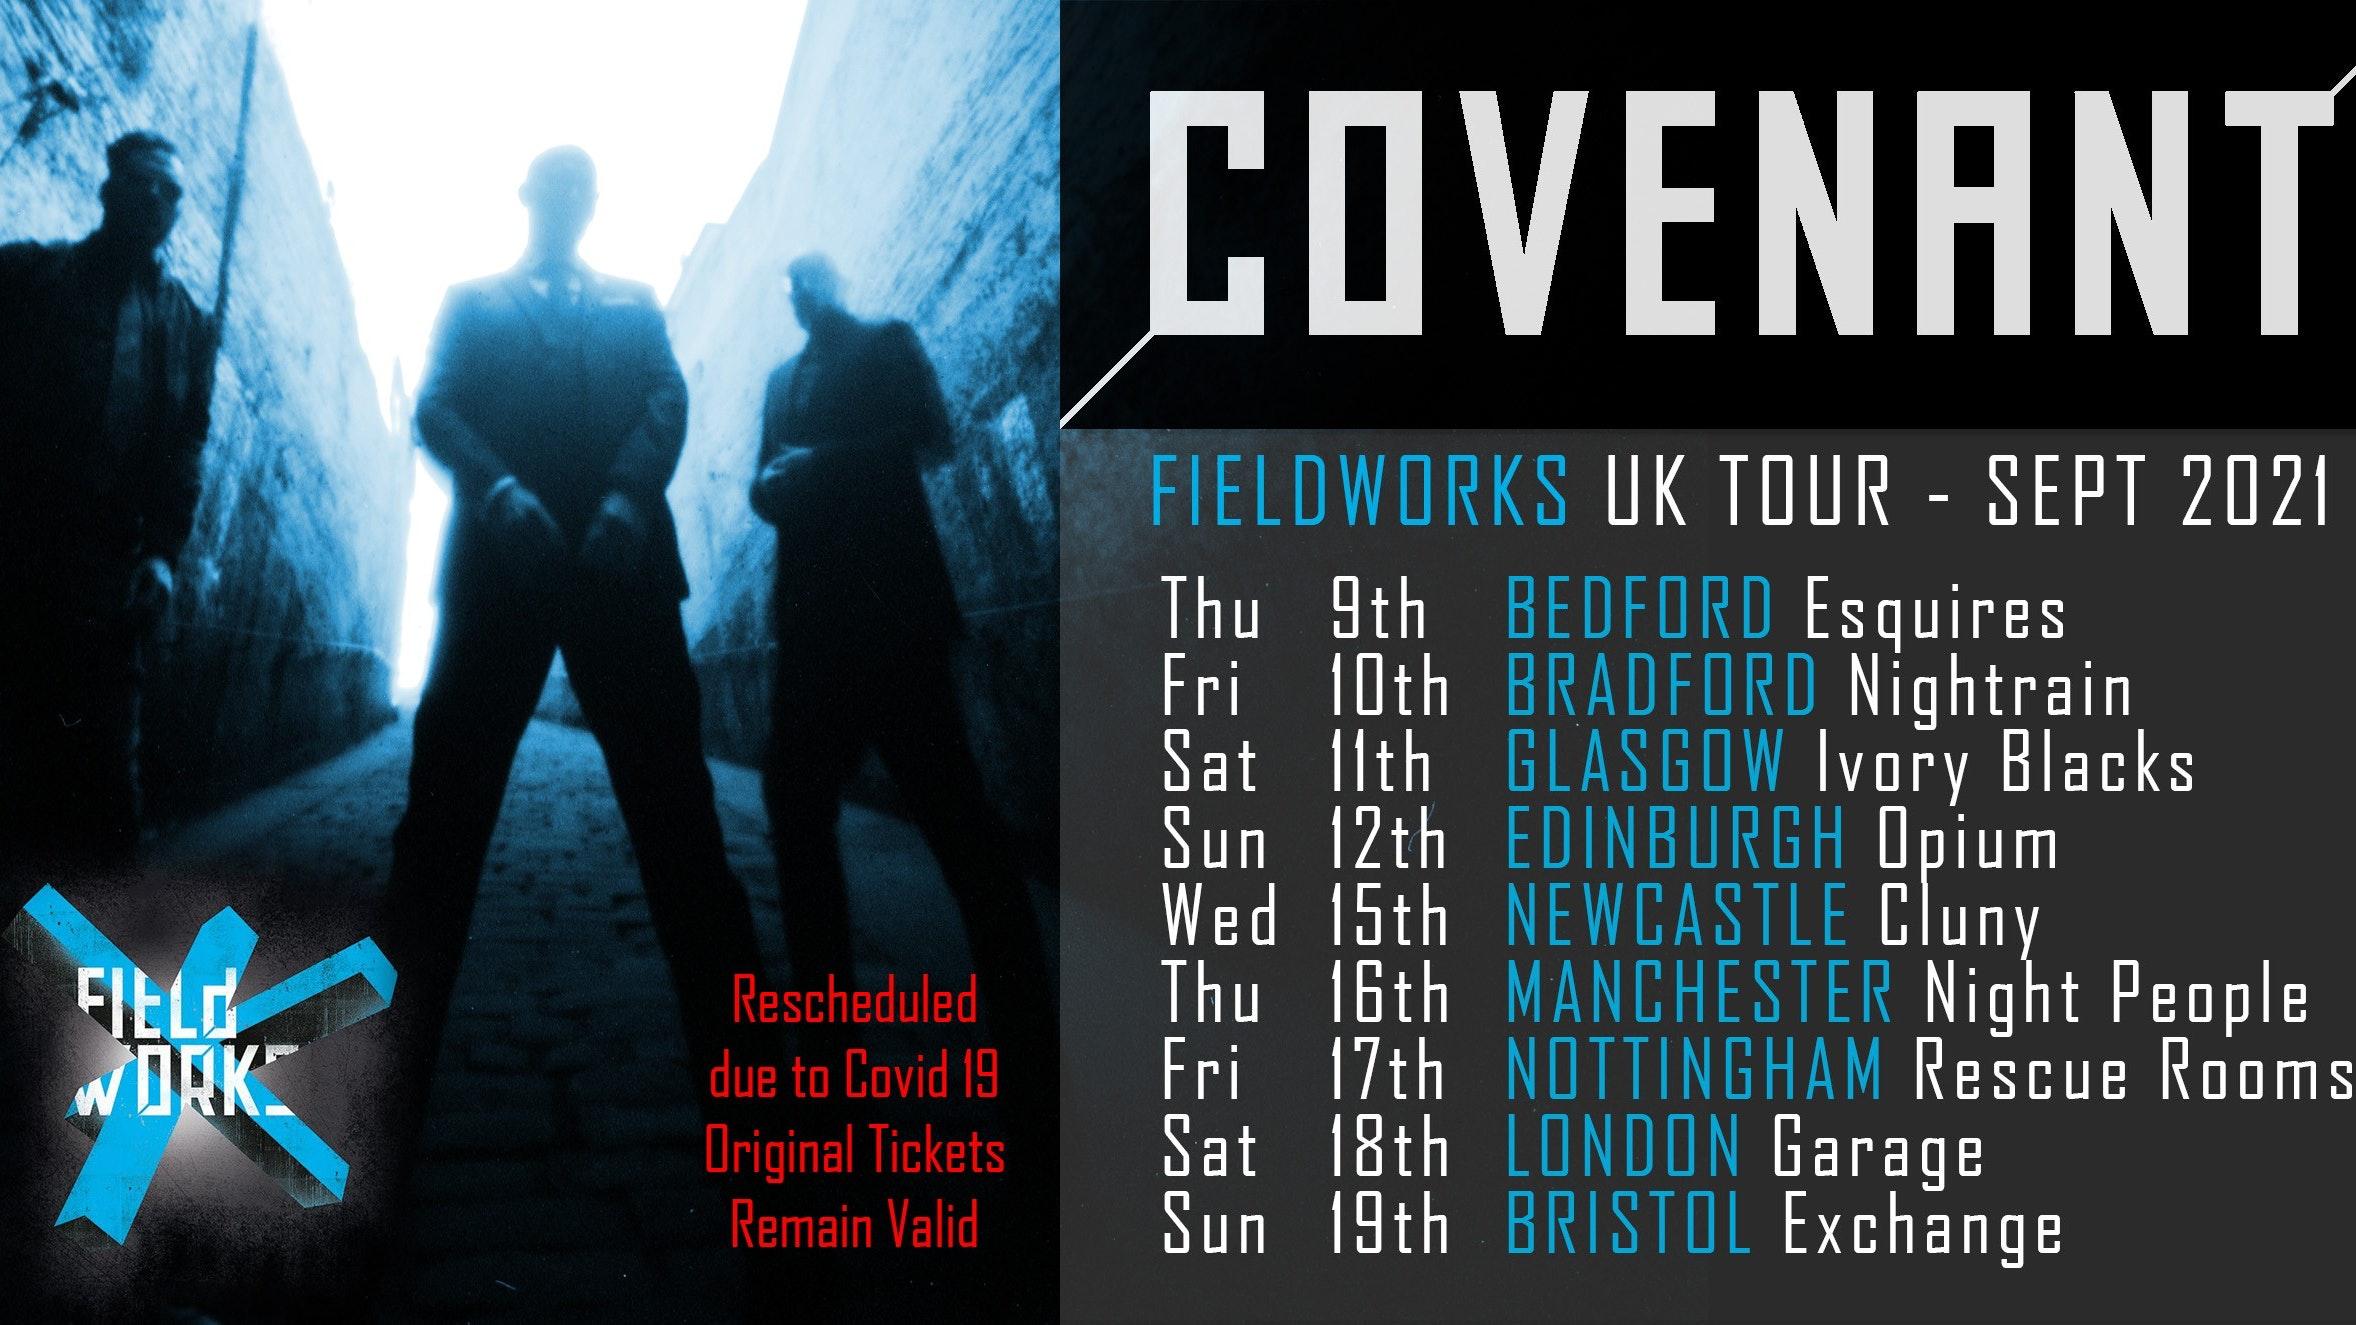 Covenant Fieldworks 2021 UK Tour – BRADFORD – NEW DATE